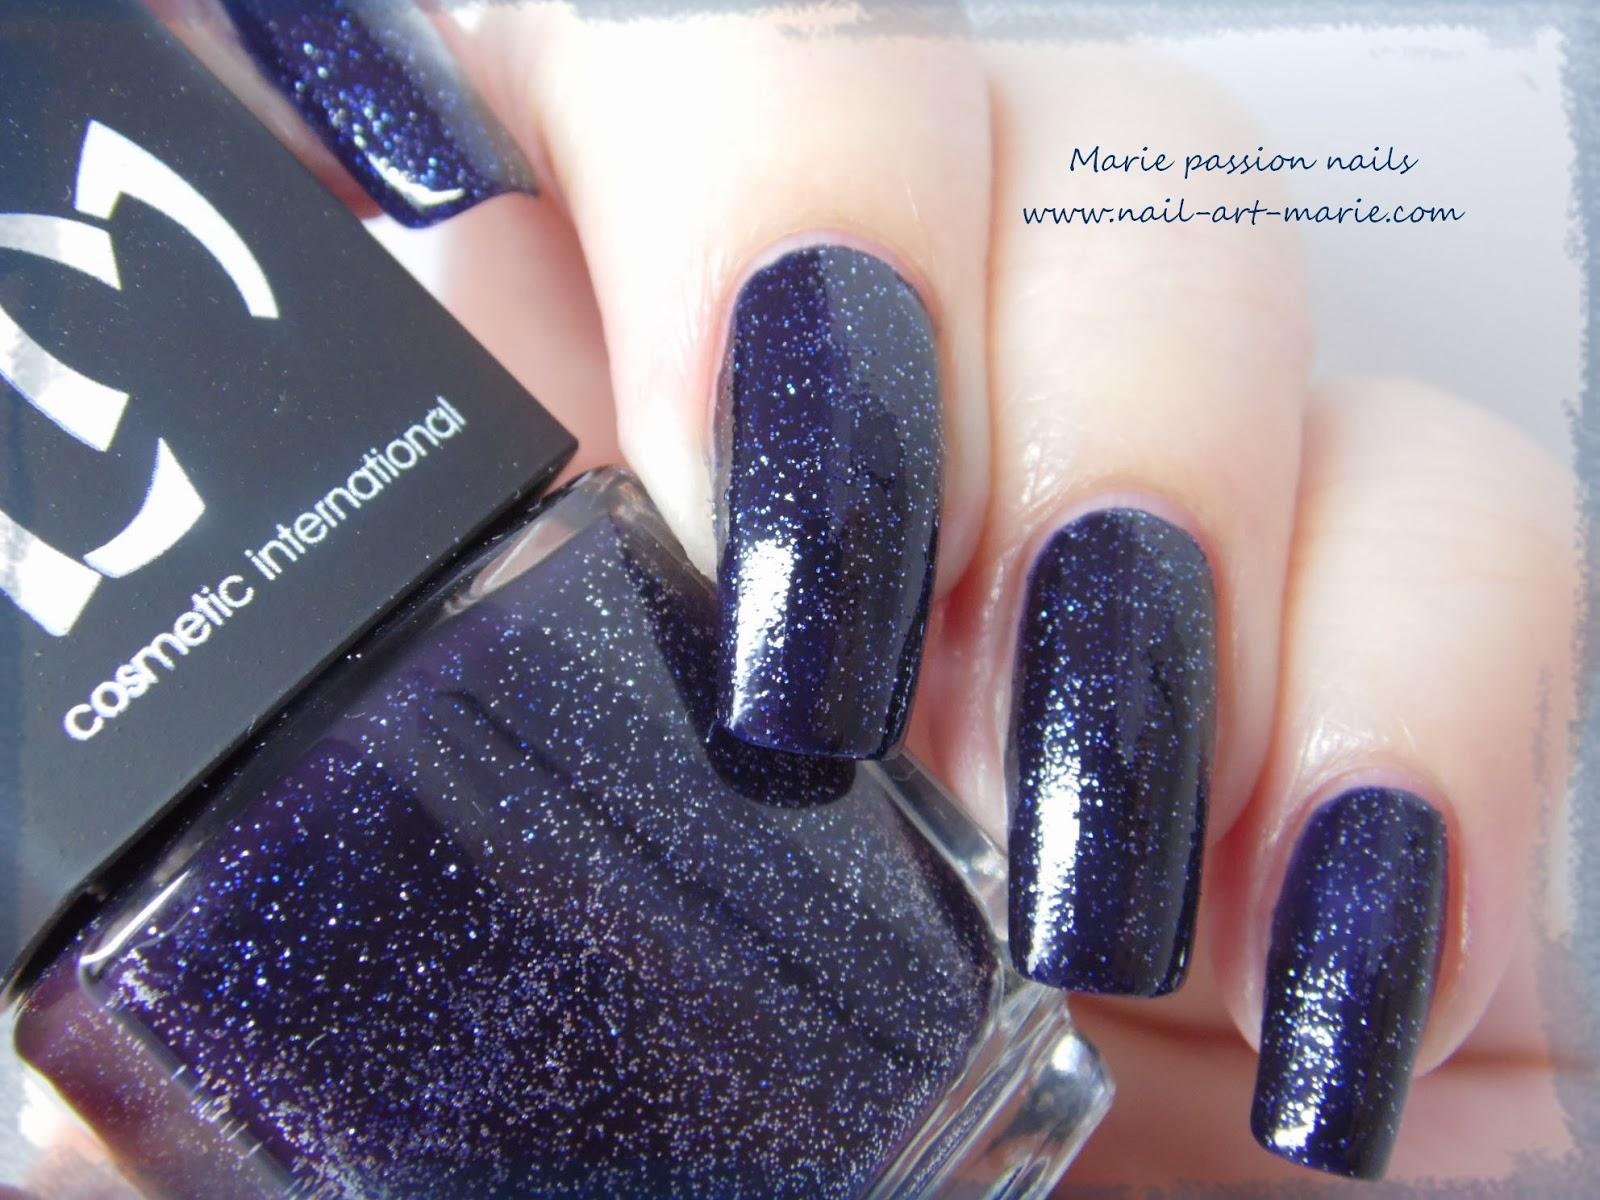 LM Cosmetic Tabarro8